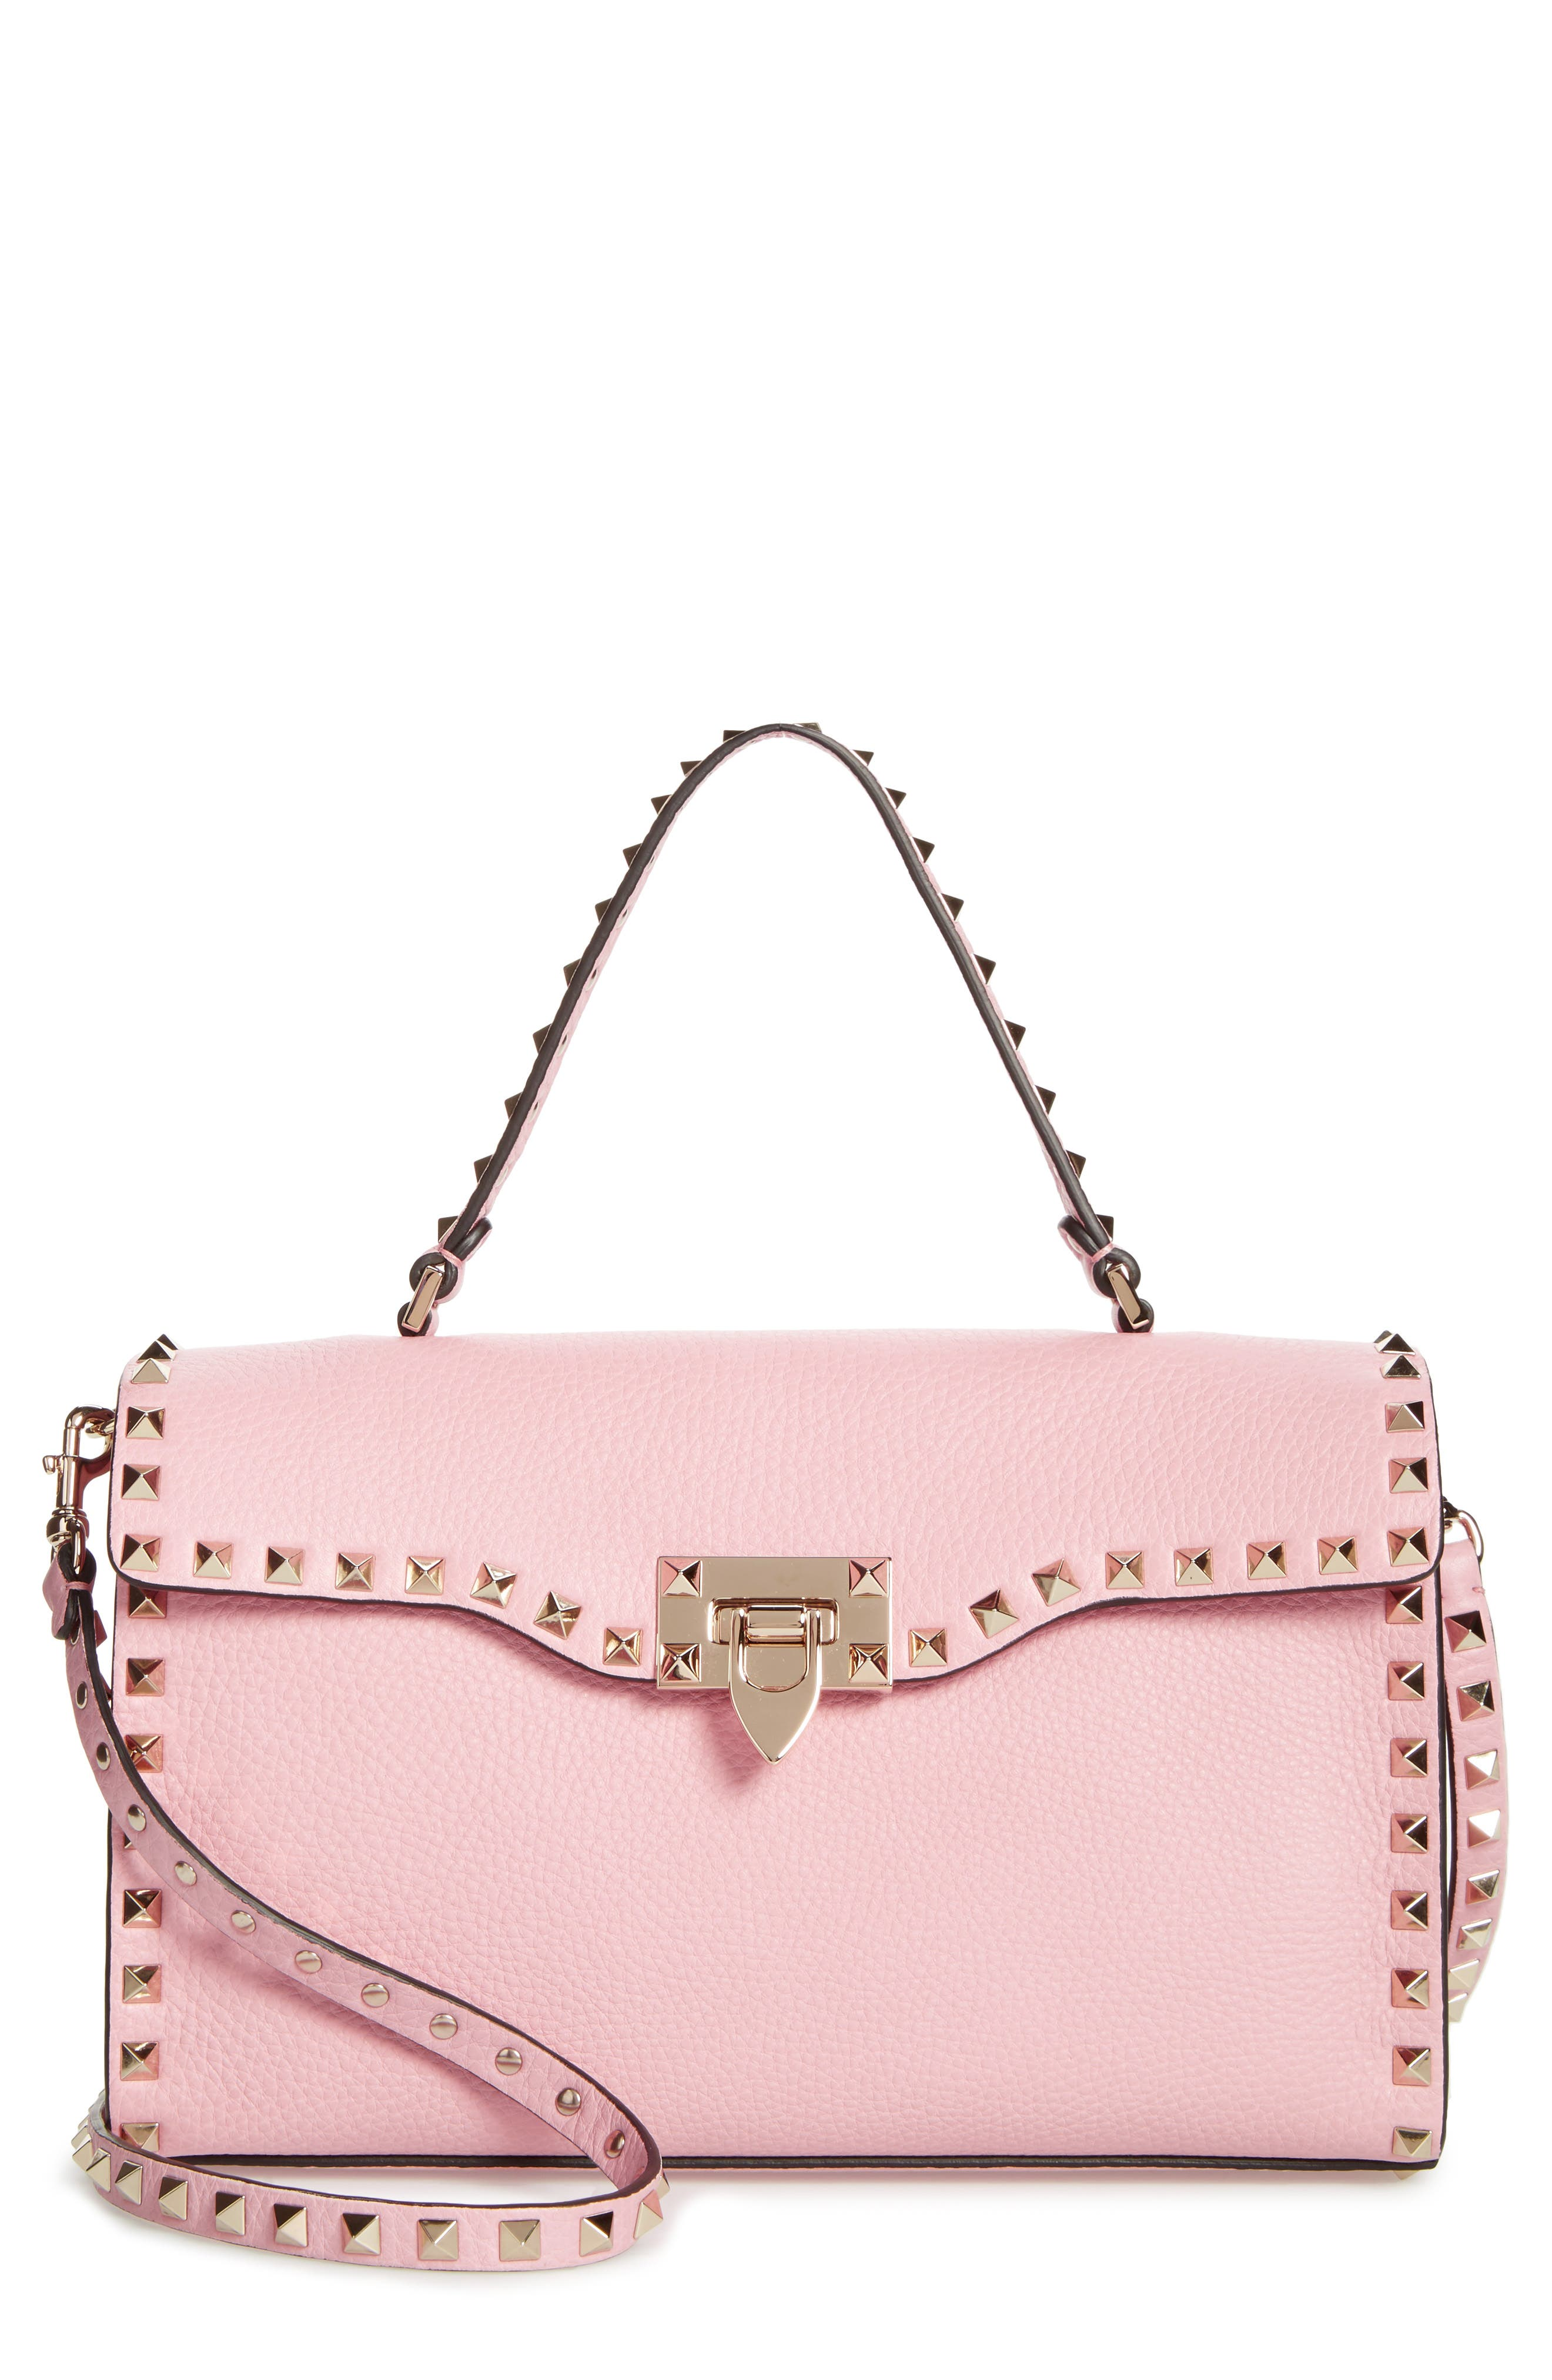 VALENTINO GARAVANI Small Rockstud Leather Single Handle Shoulder Bag